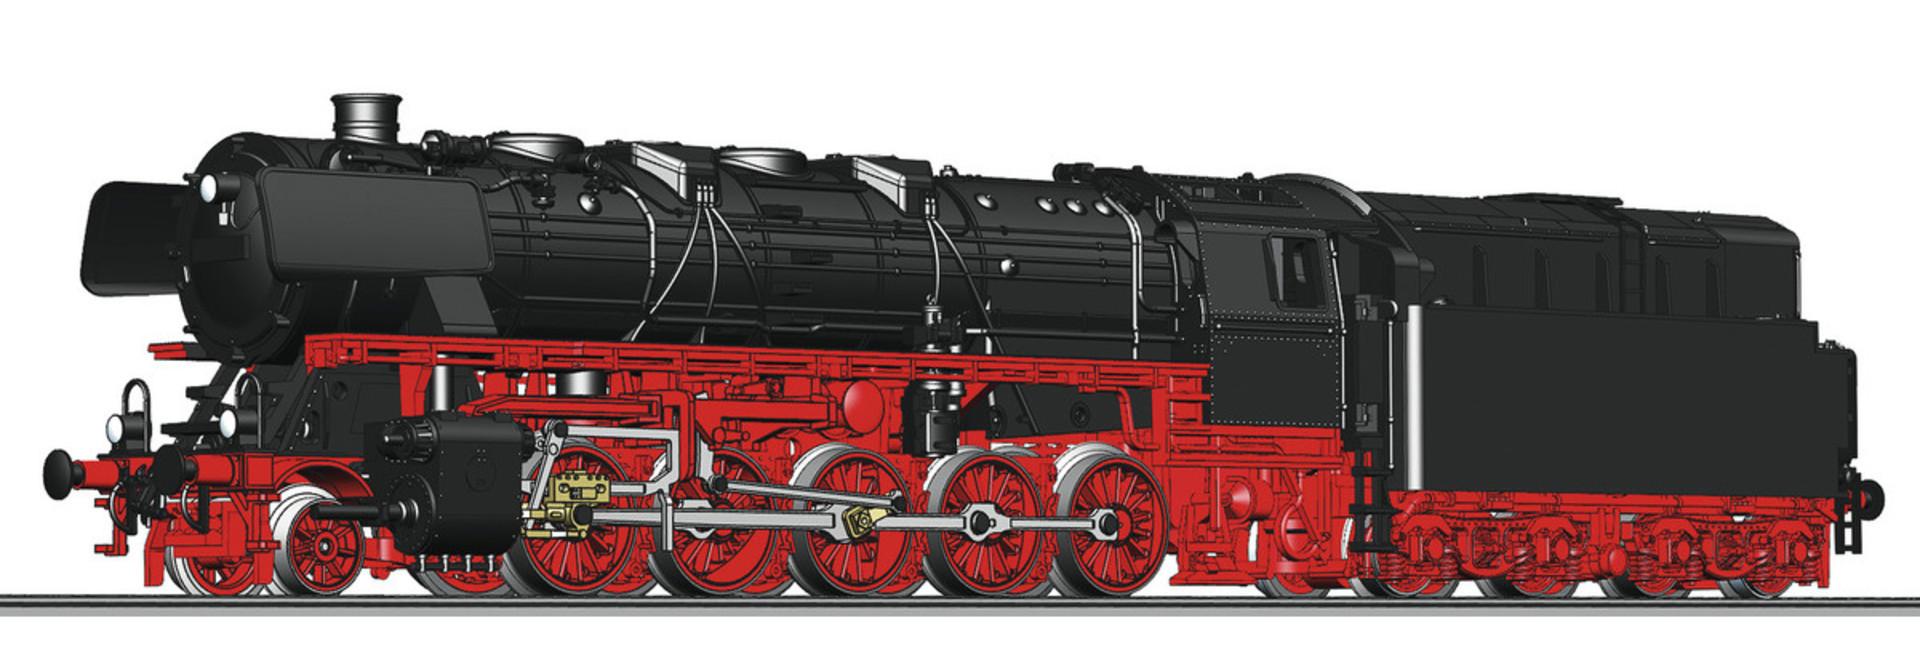 714474 Dampflok BR 043. DB Öl HE SND.